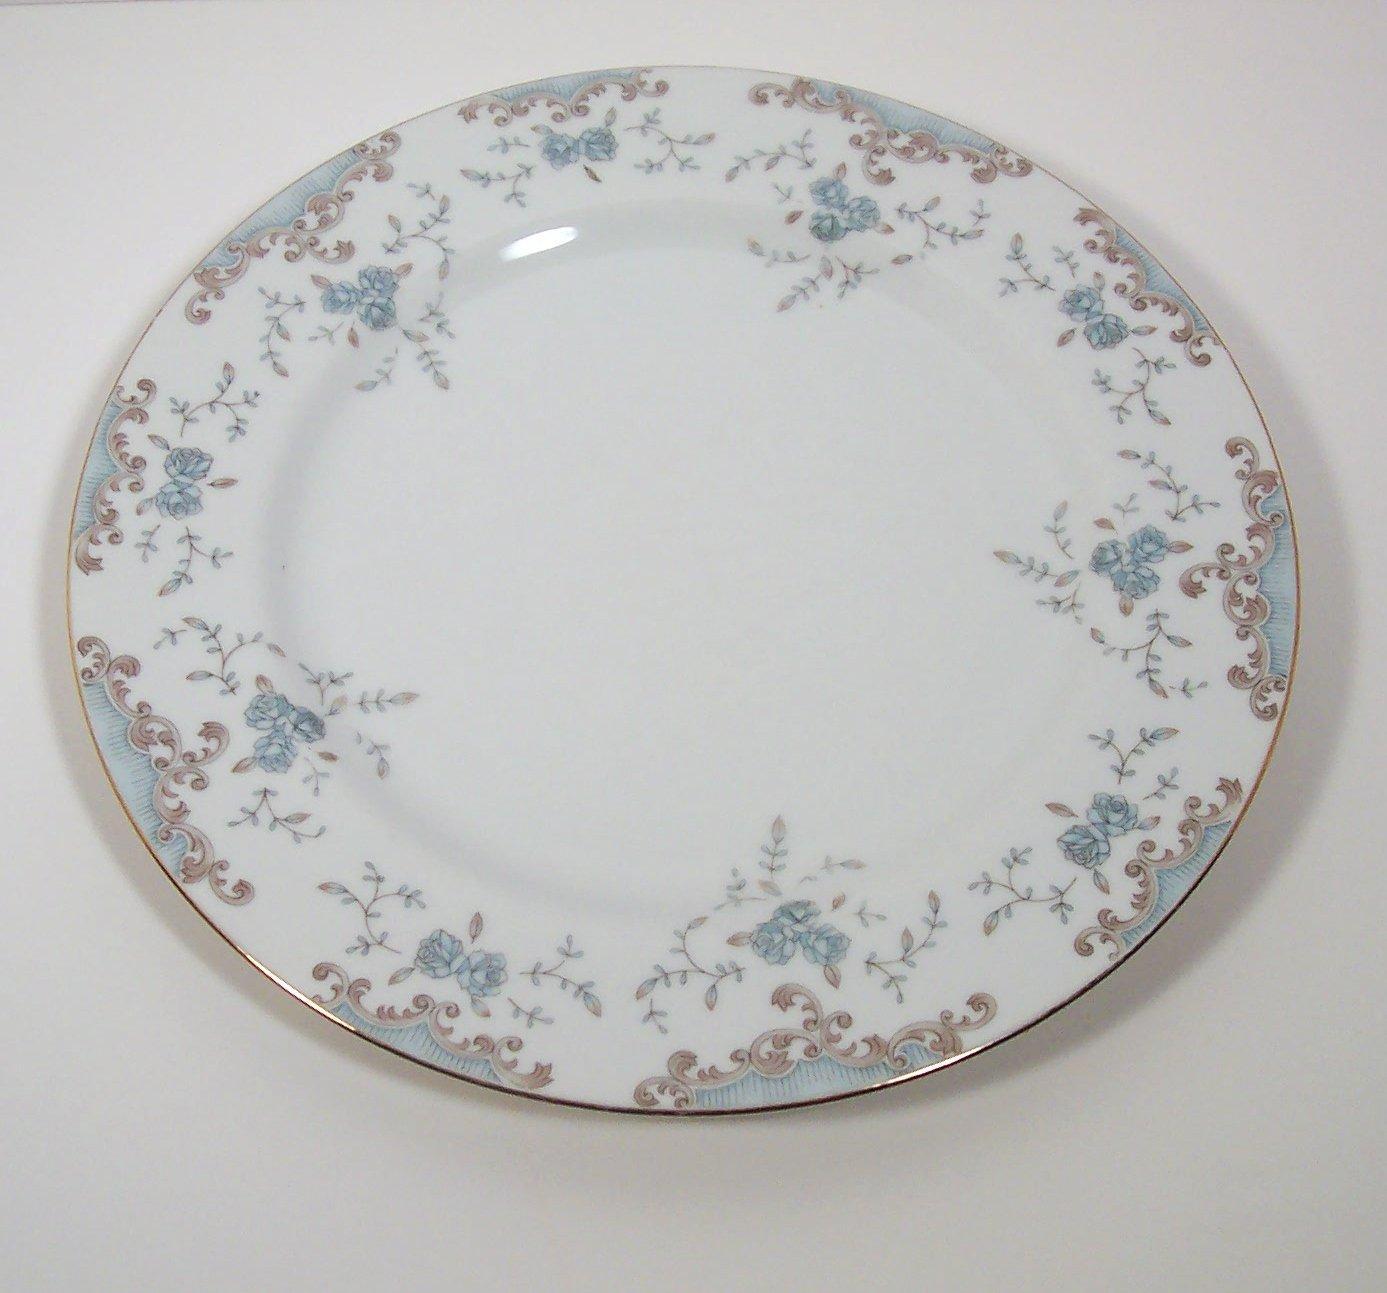 & Mikasa Fine China Seville Dinner Plate 10 3/8